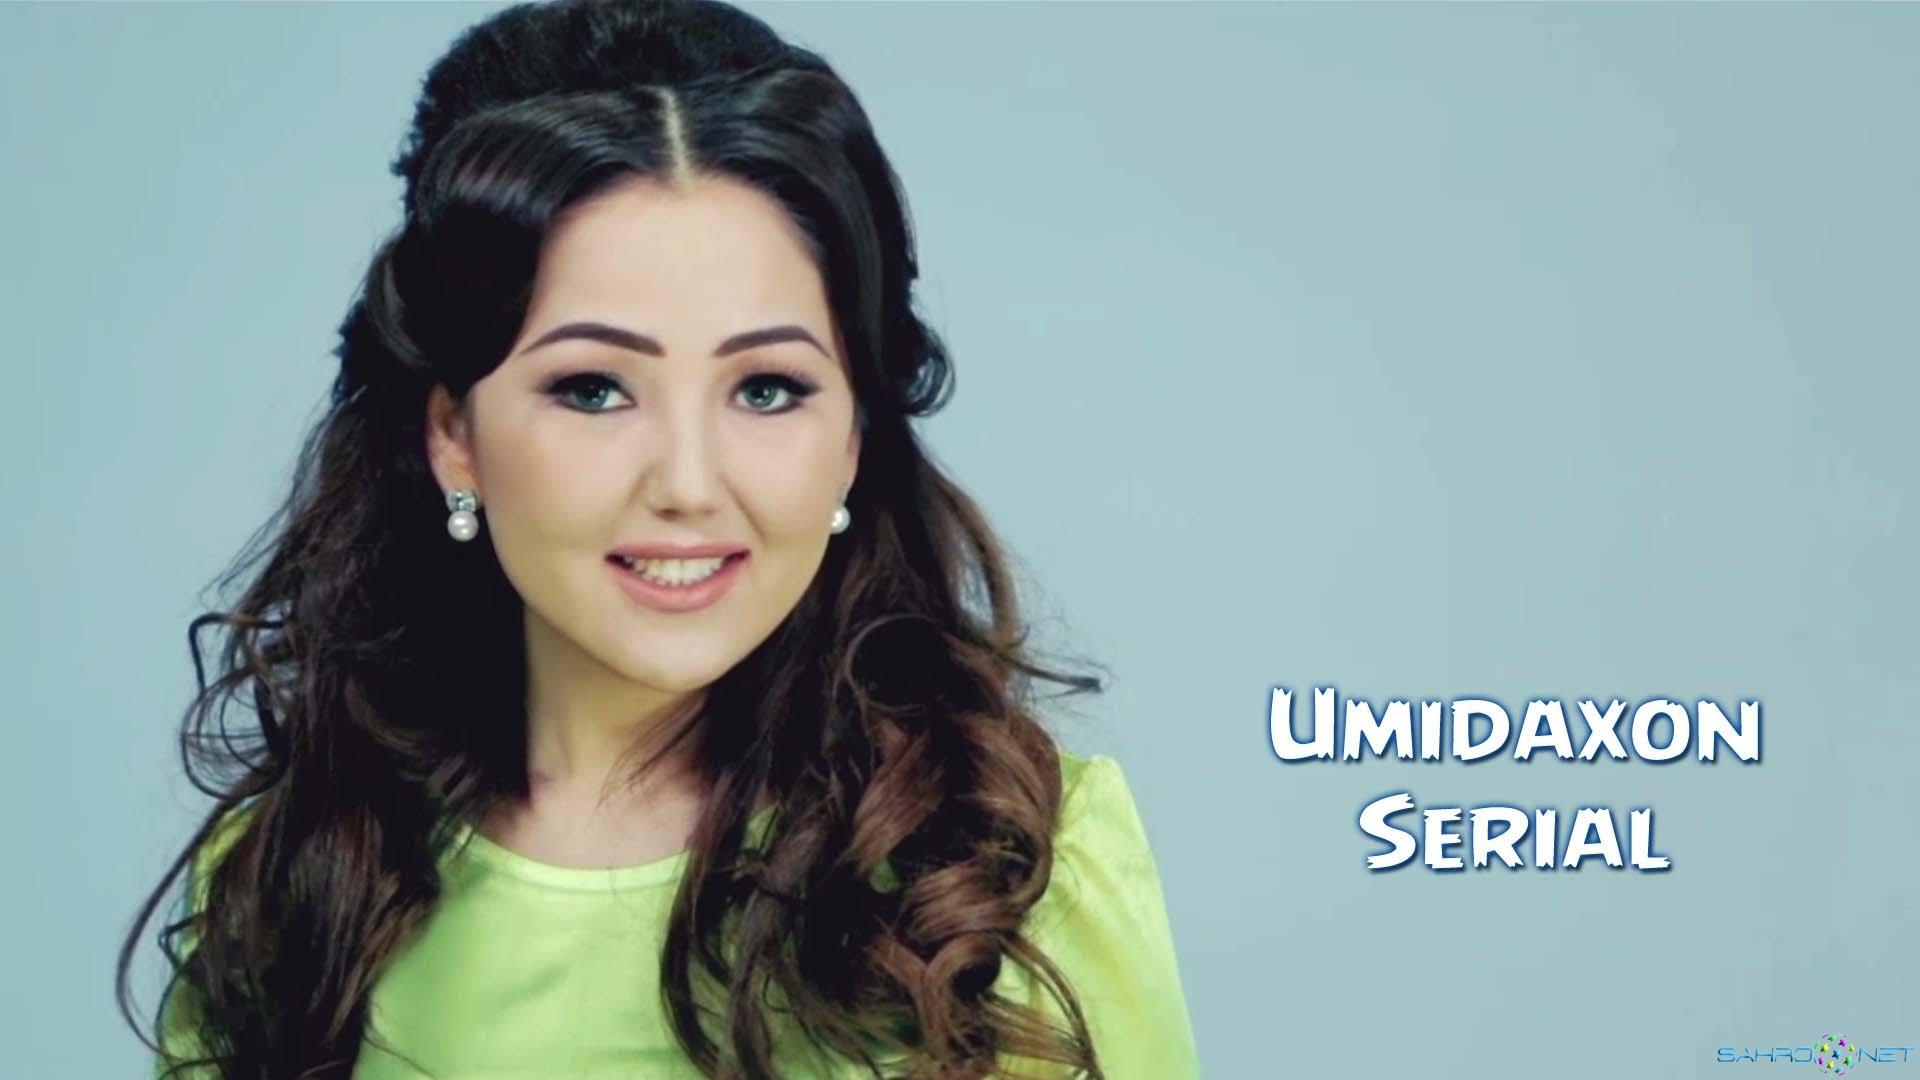 Umidaxon - Serial Узбек Клип 2015